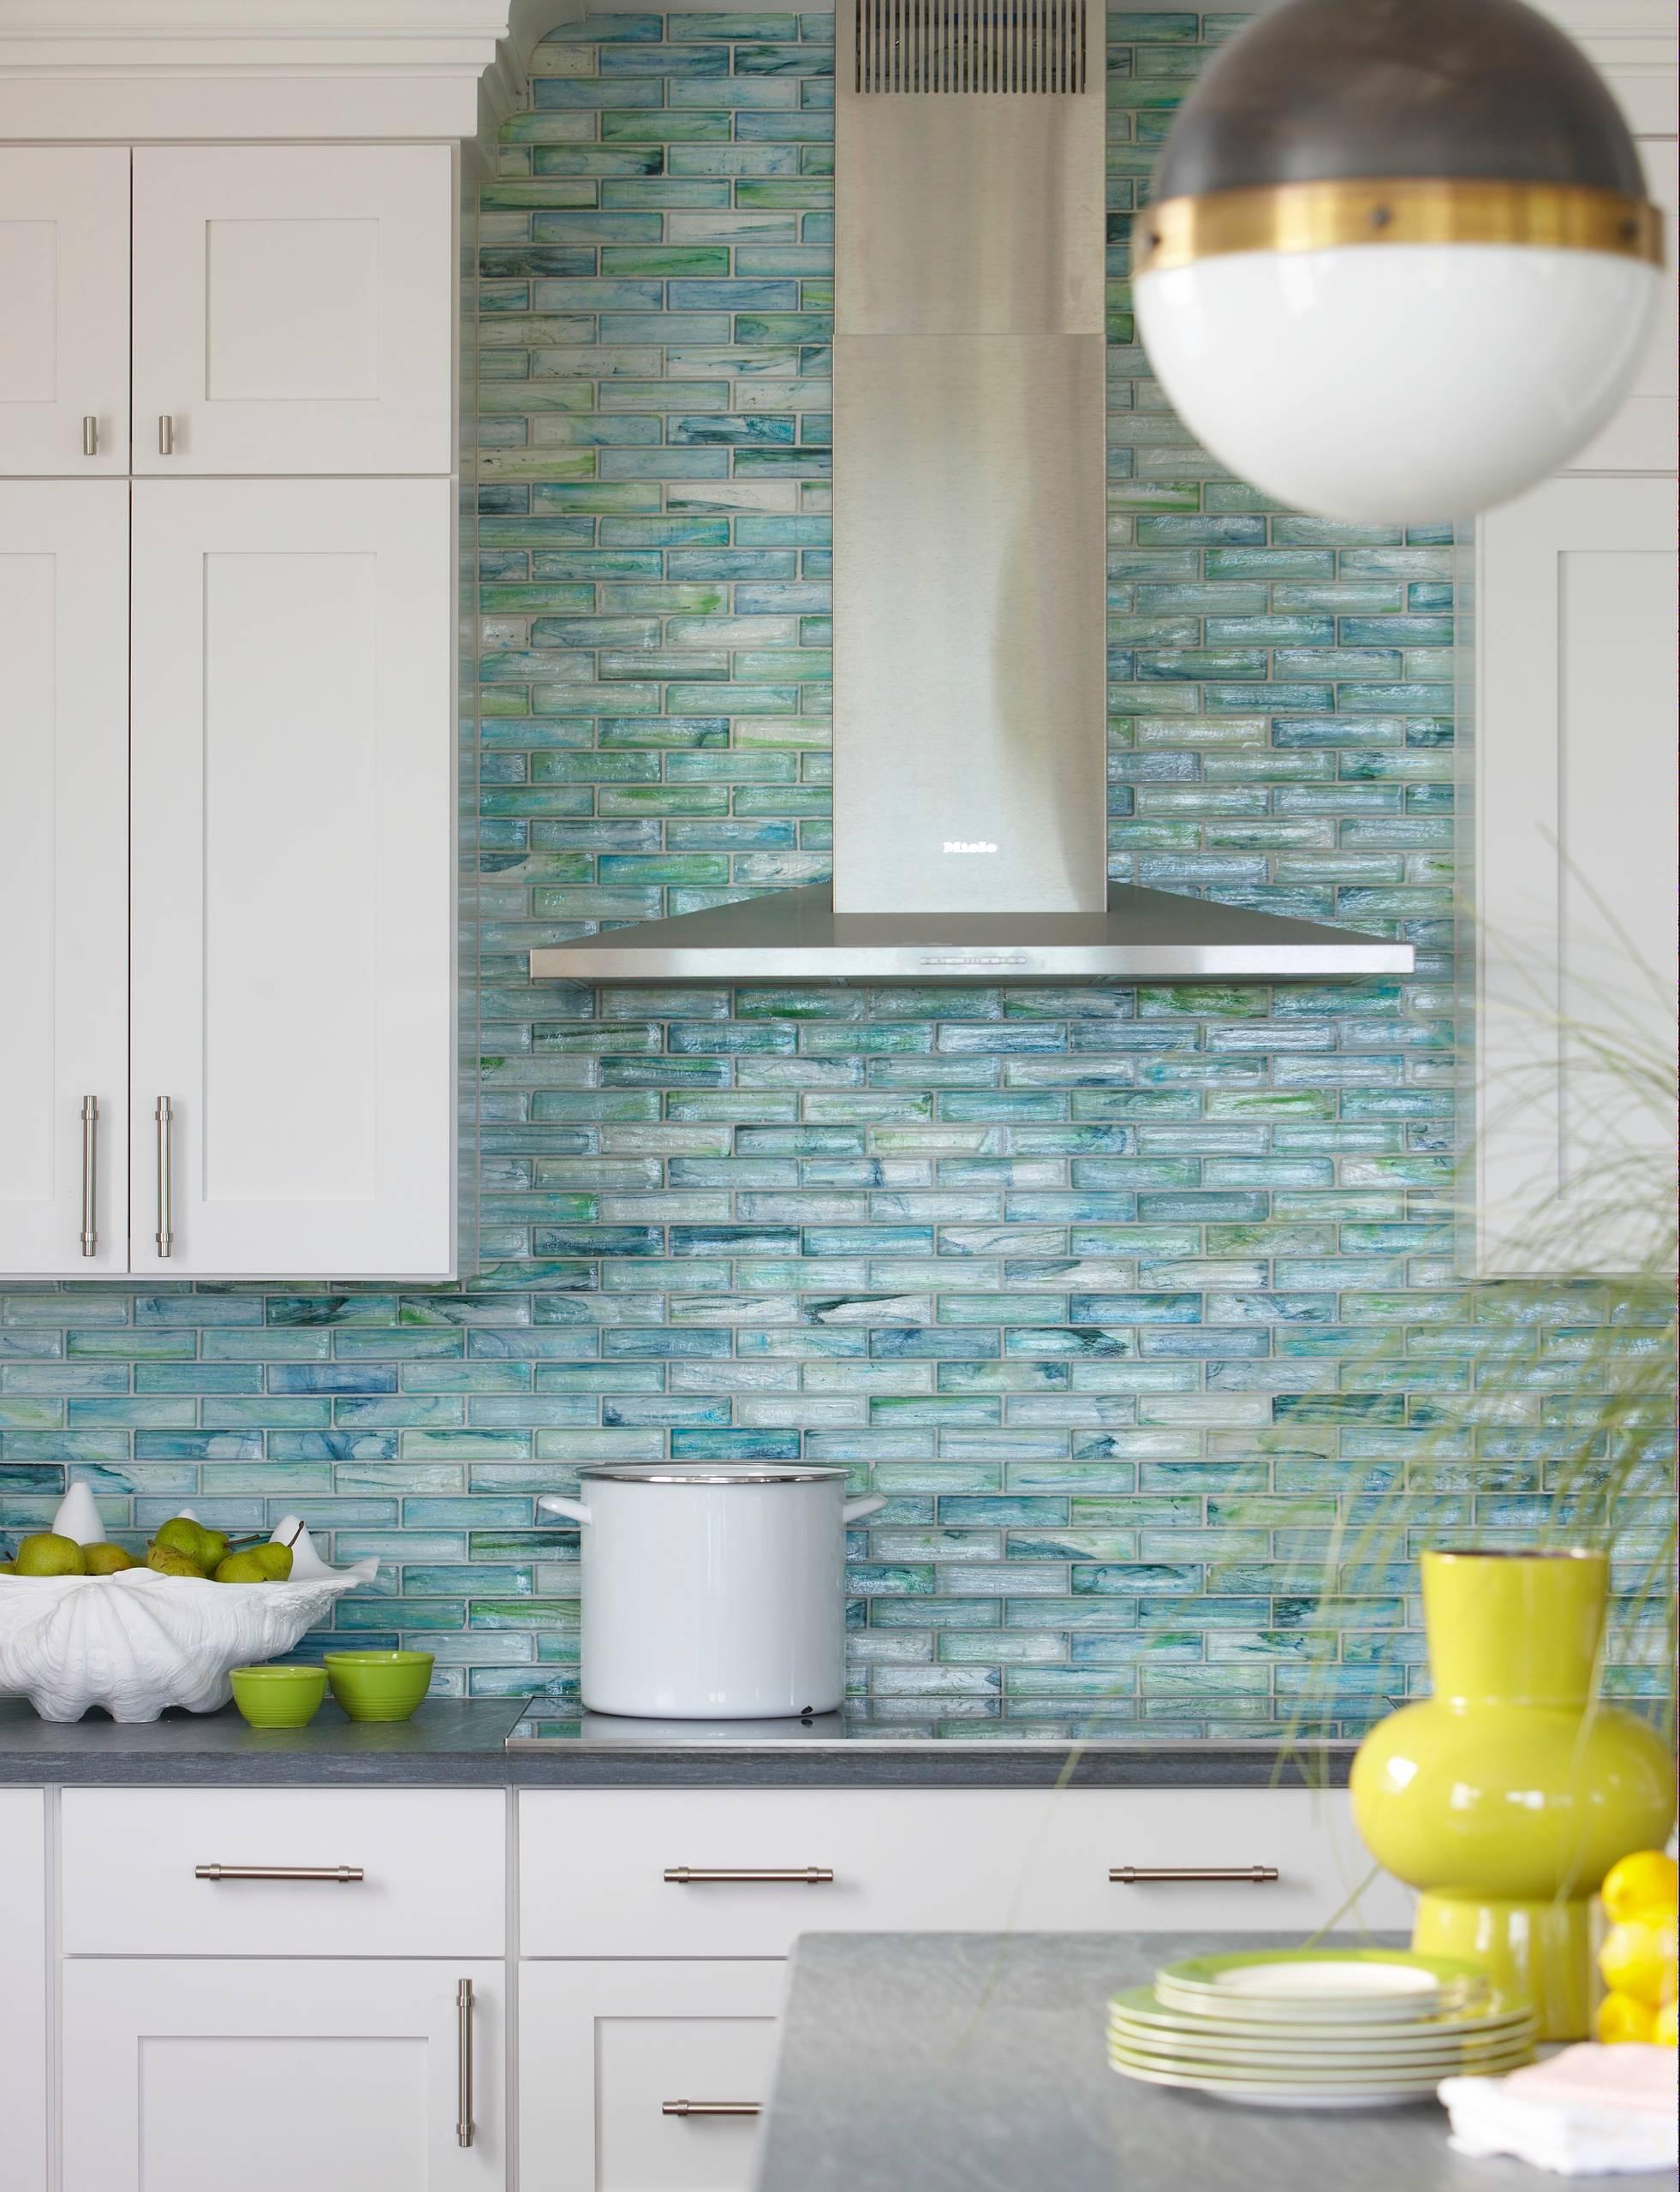 - 75 Beautiful Coastal Kitchen With Glass Tile Backsplash Pictures